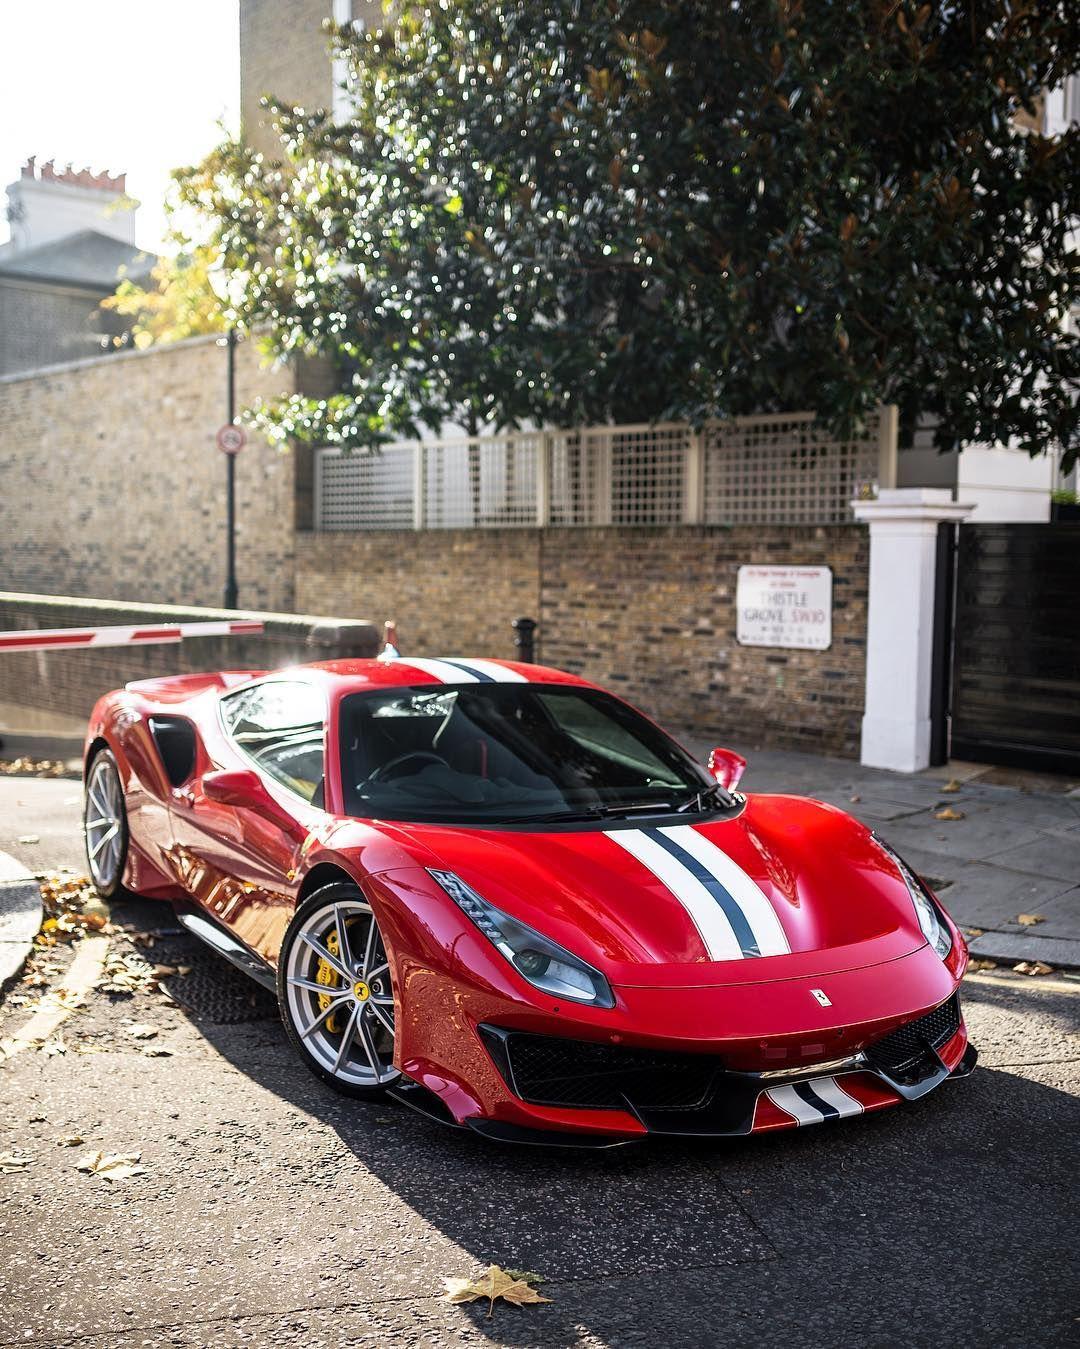 488 Pista Luxury Cars Pinterest Ferrari 488 Ferrari And